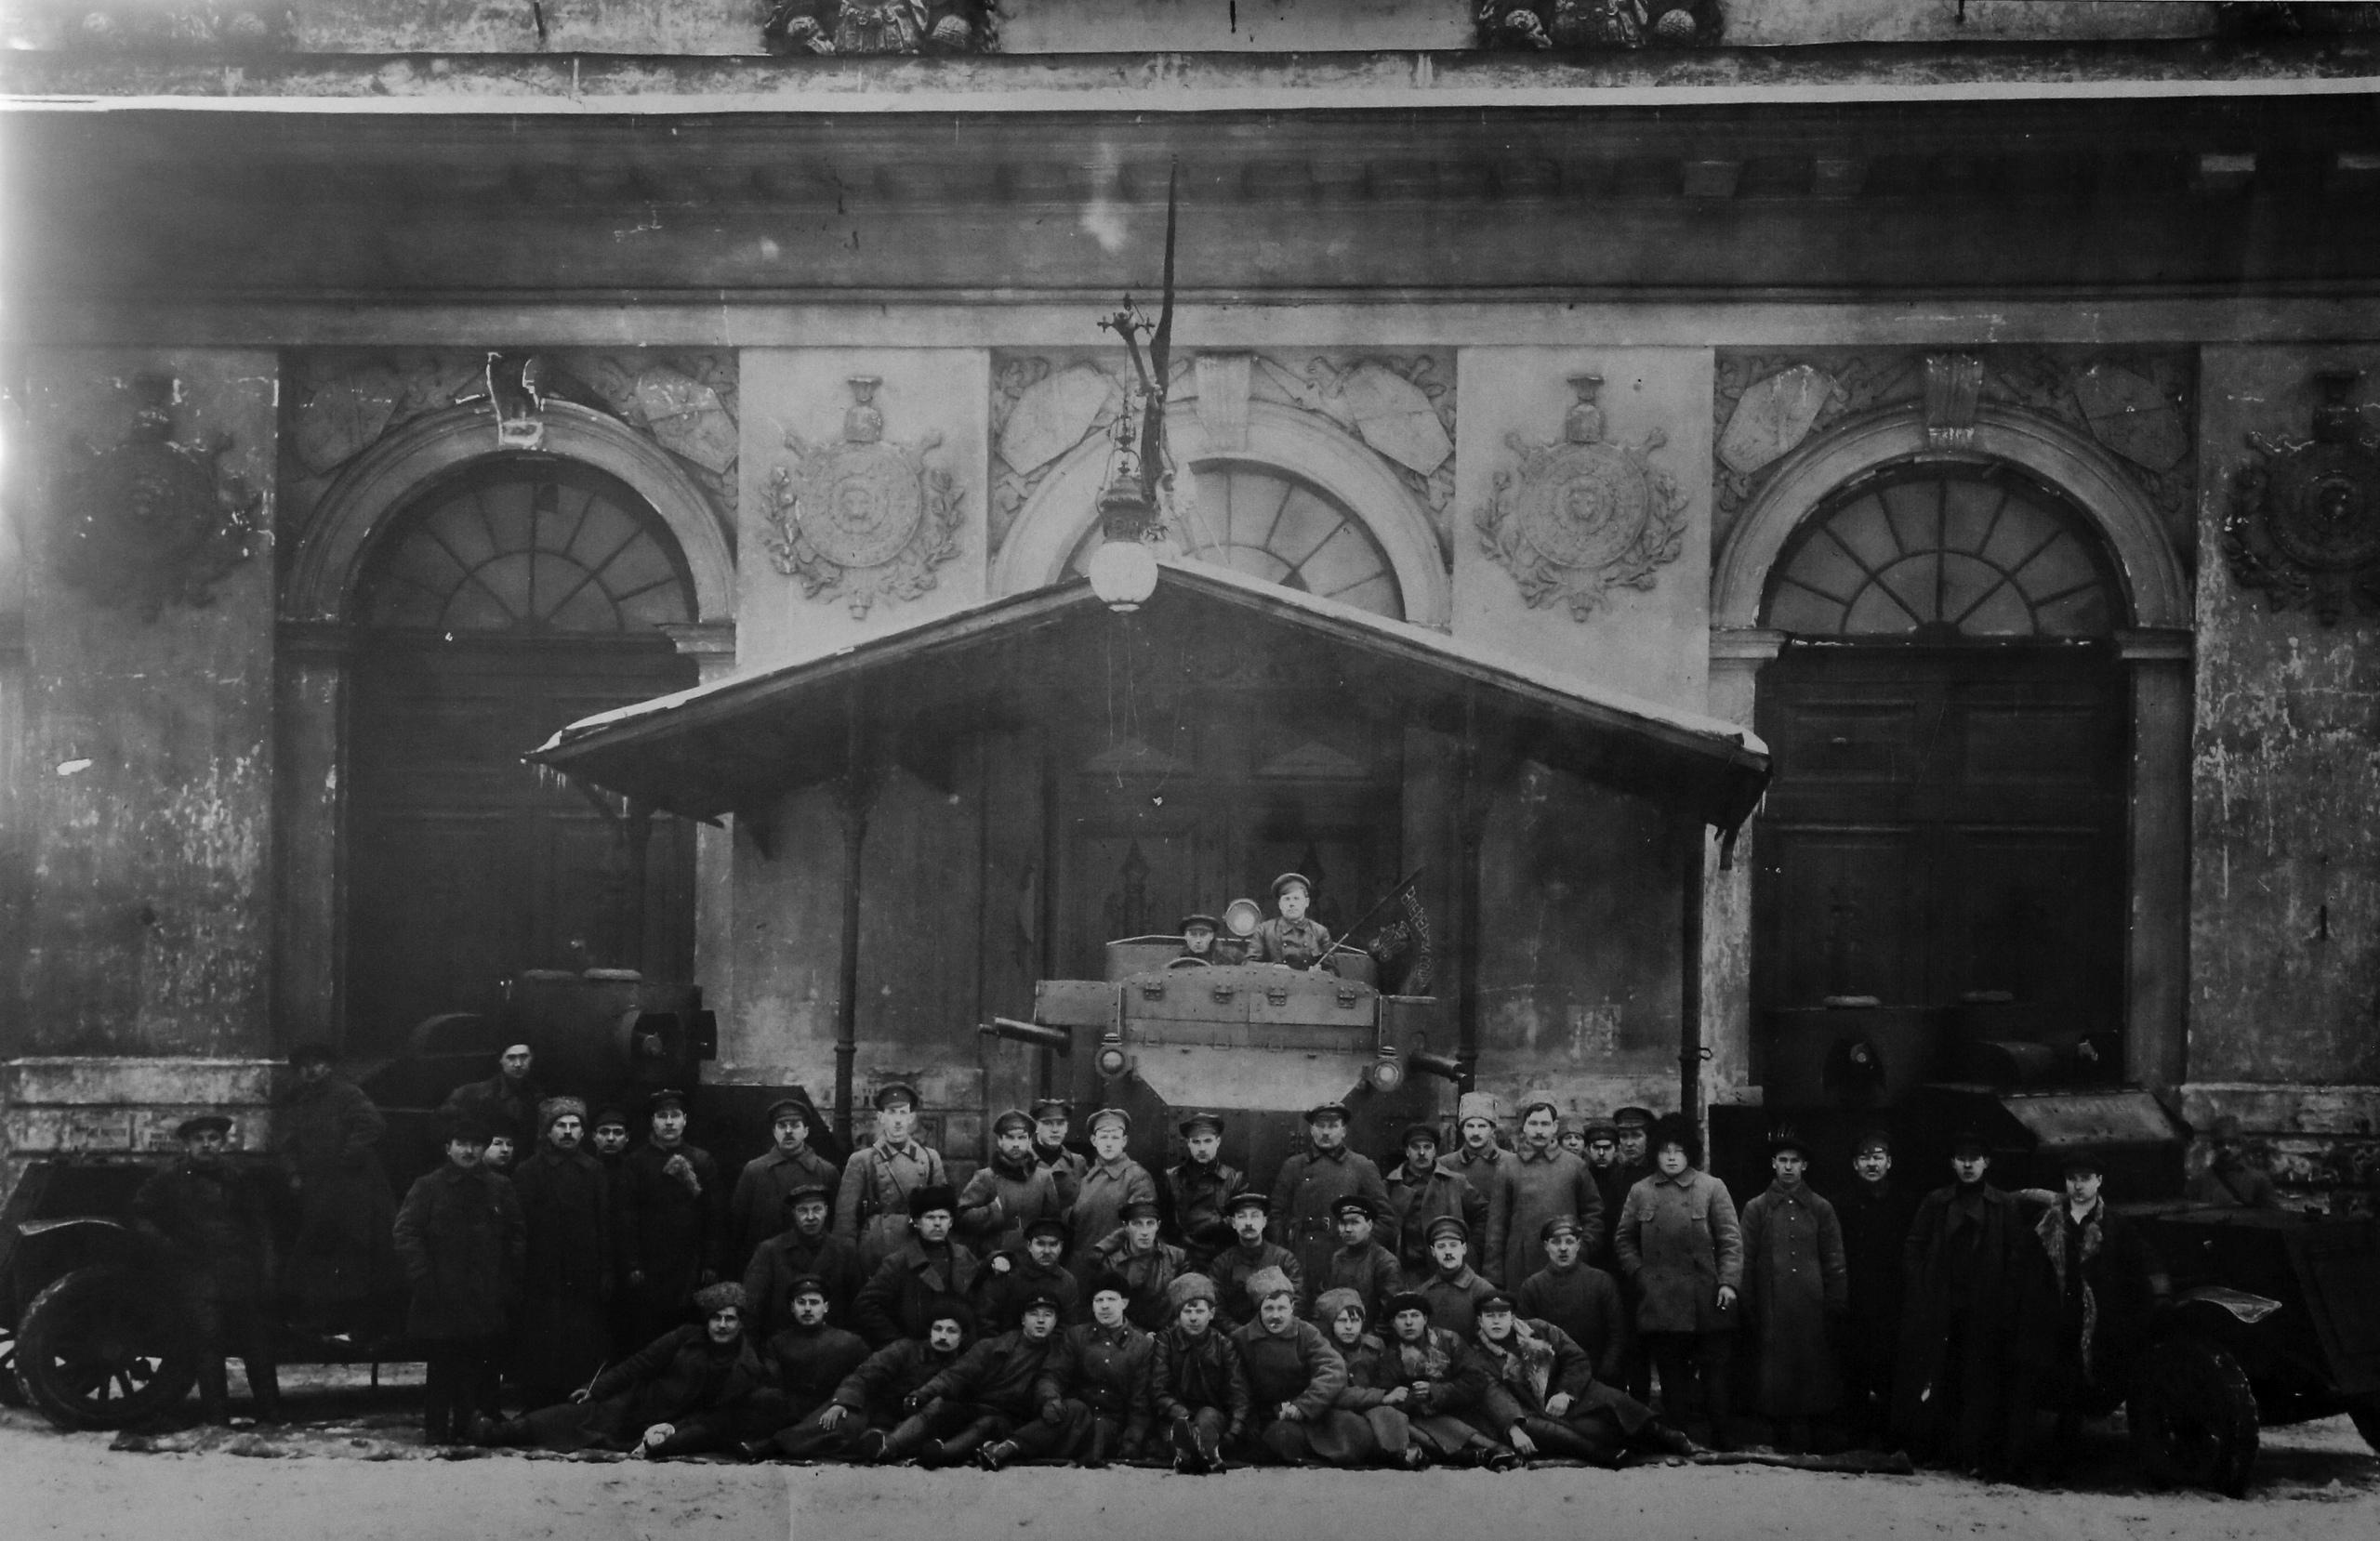 Бронированный отряд. Петроград. 6 марта